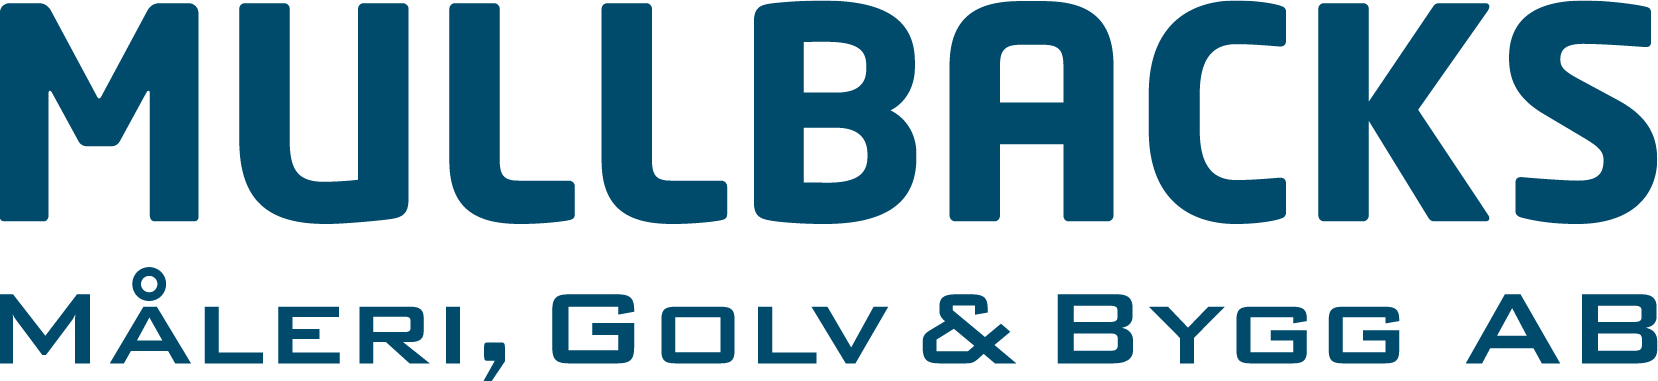 Mullbacks Måleri & Golv AB